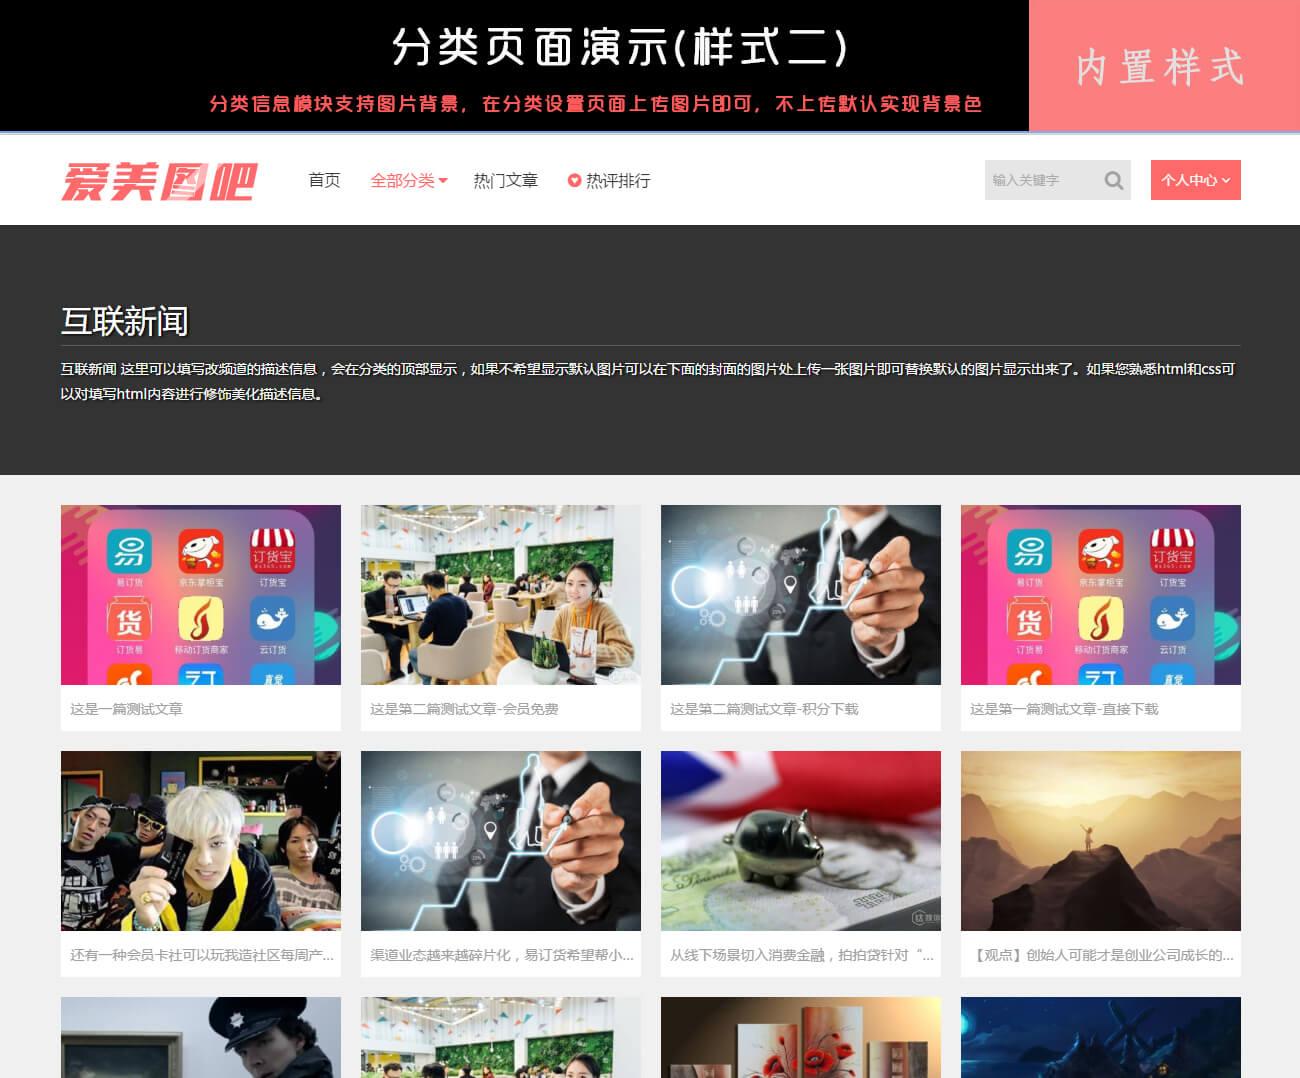 WordPress图片主题 多功能CX-UDY 3.2图片主题破解版去授权版本